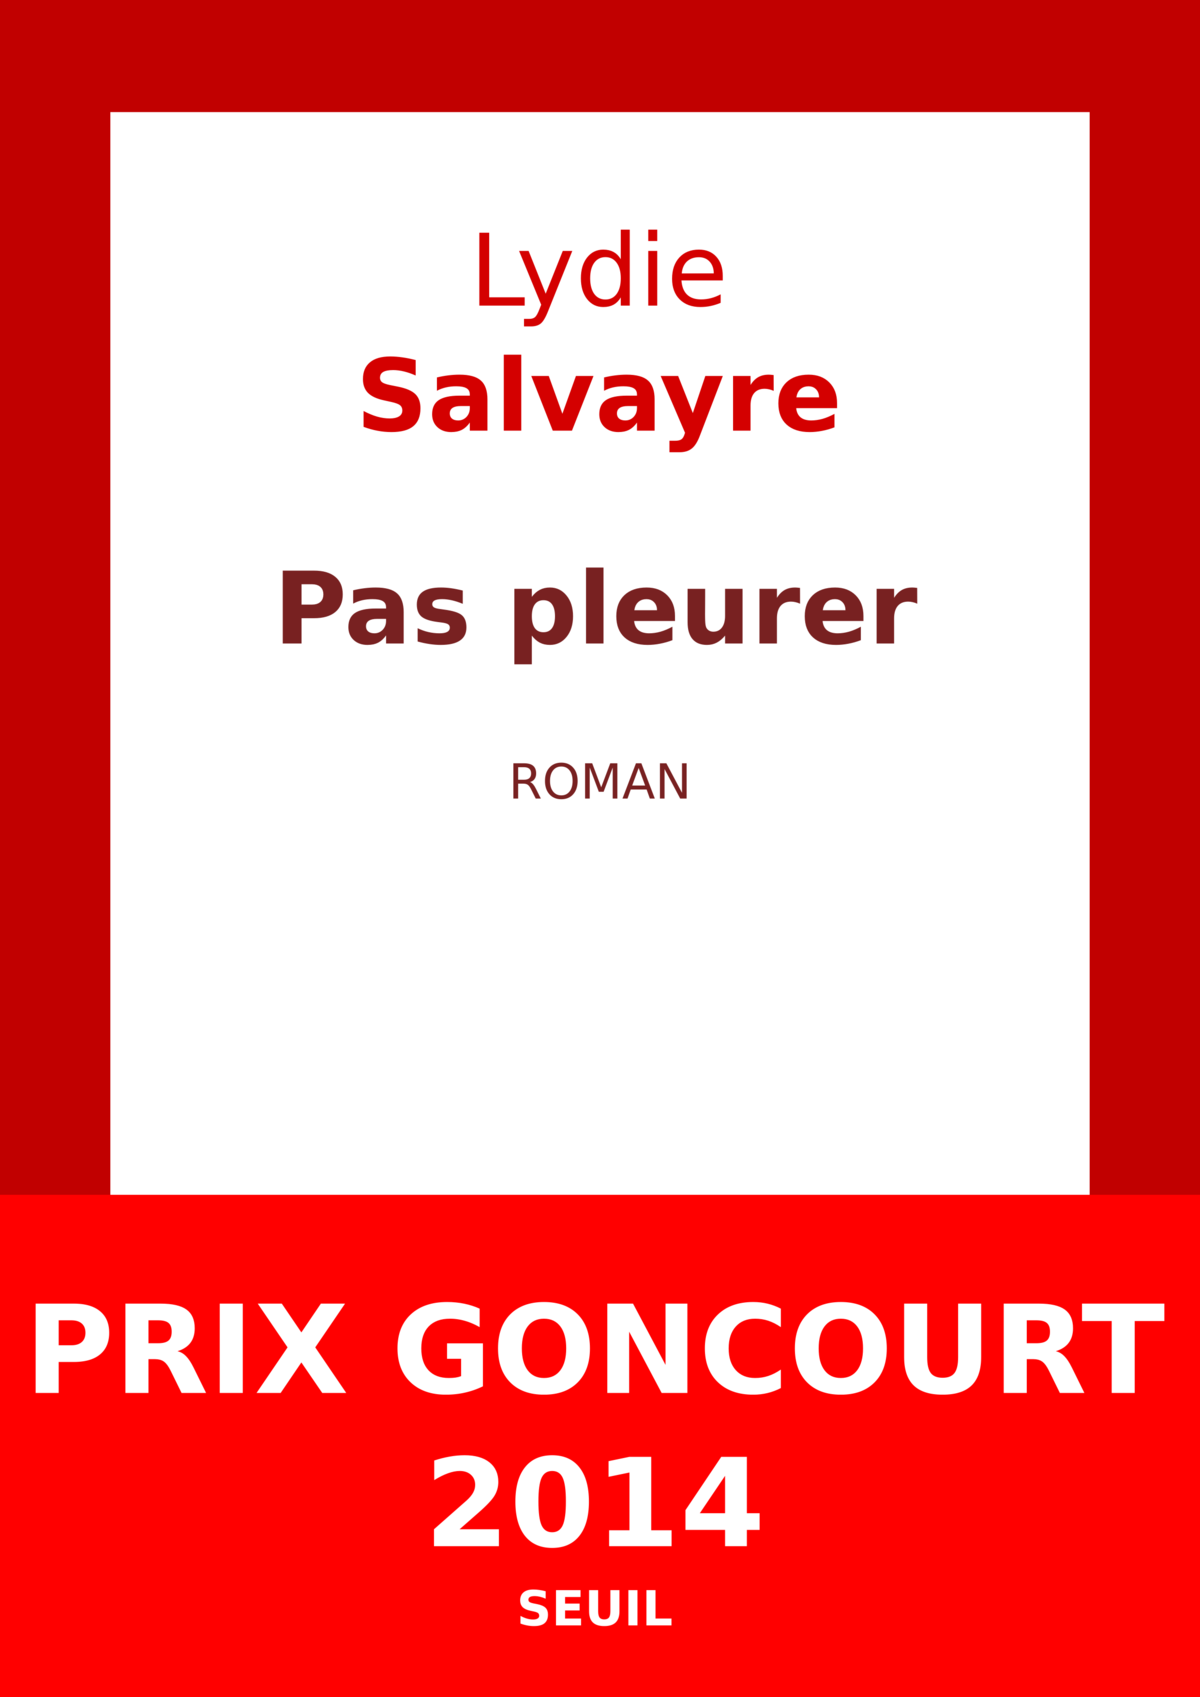 Lydie_Salvayre_-_Pas_pleurer